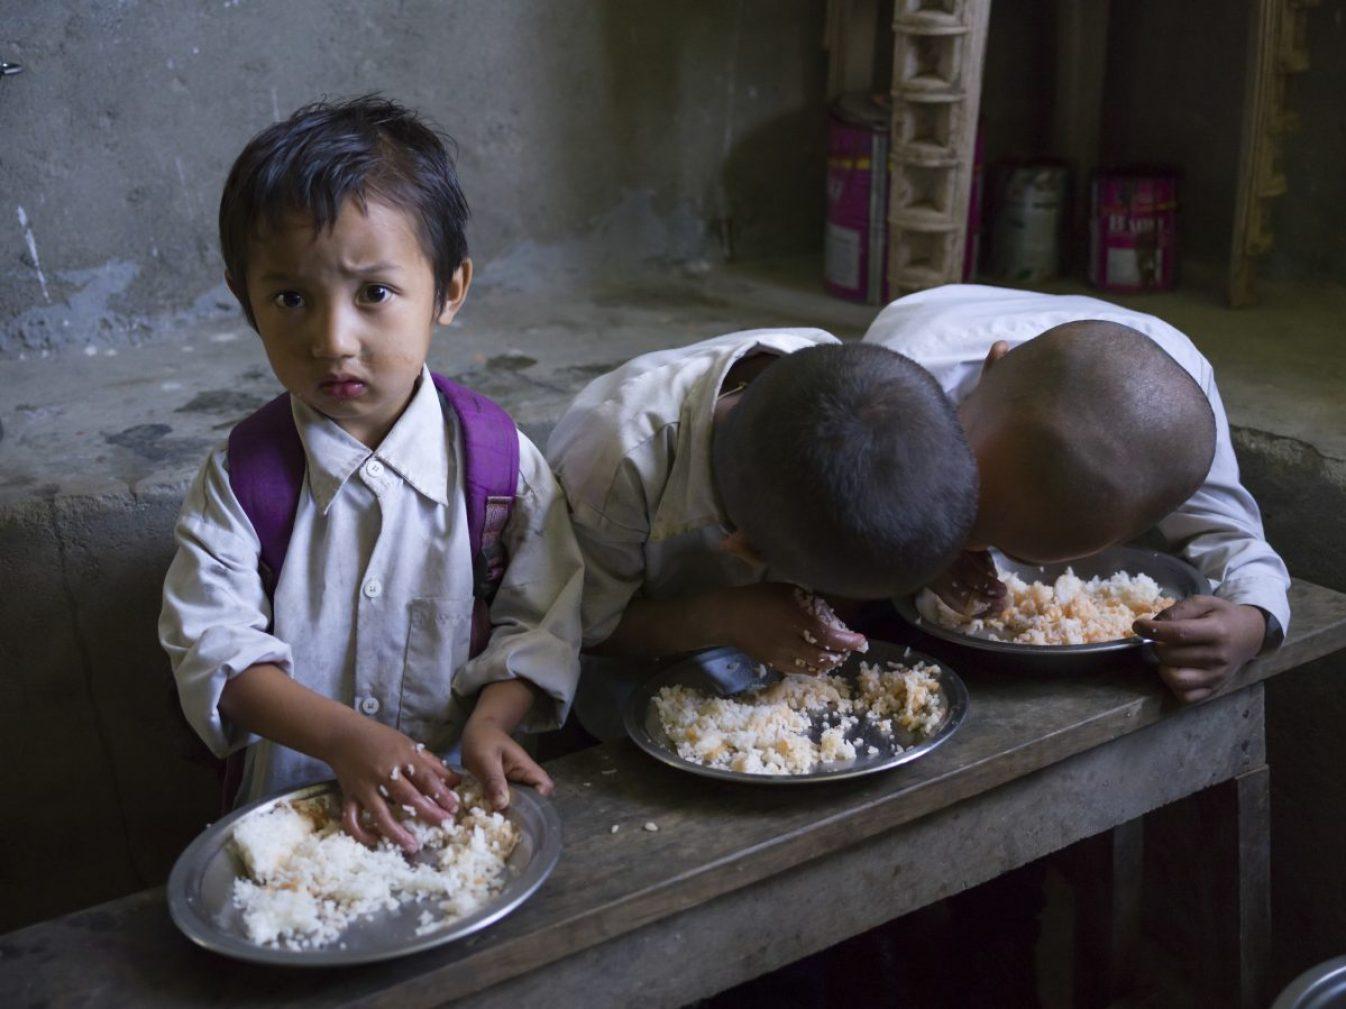 children.  School children having lunch at school, Radhu Khandu Village, Sikkim, India.  Image credit: Keith Levitt / 123rf.  Illustration of global hunger article.